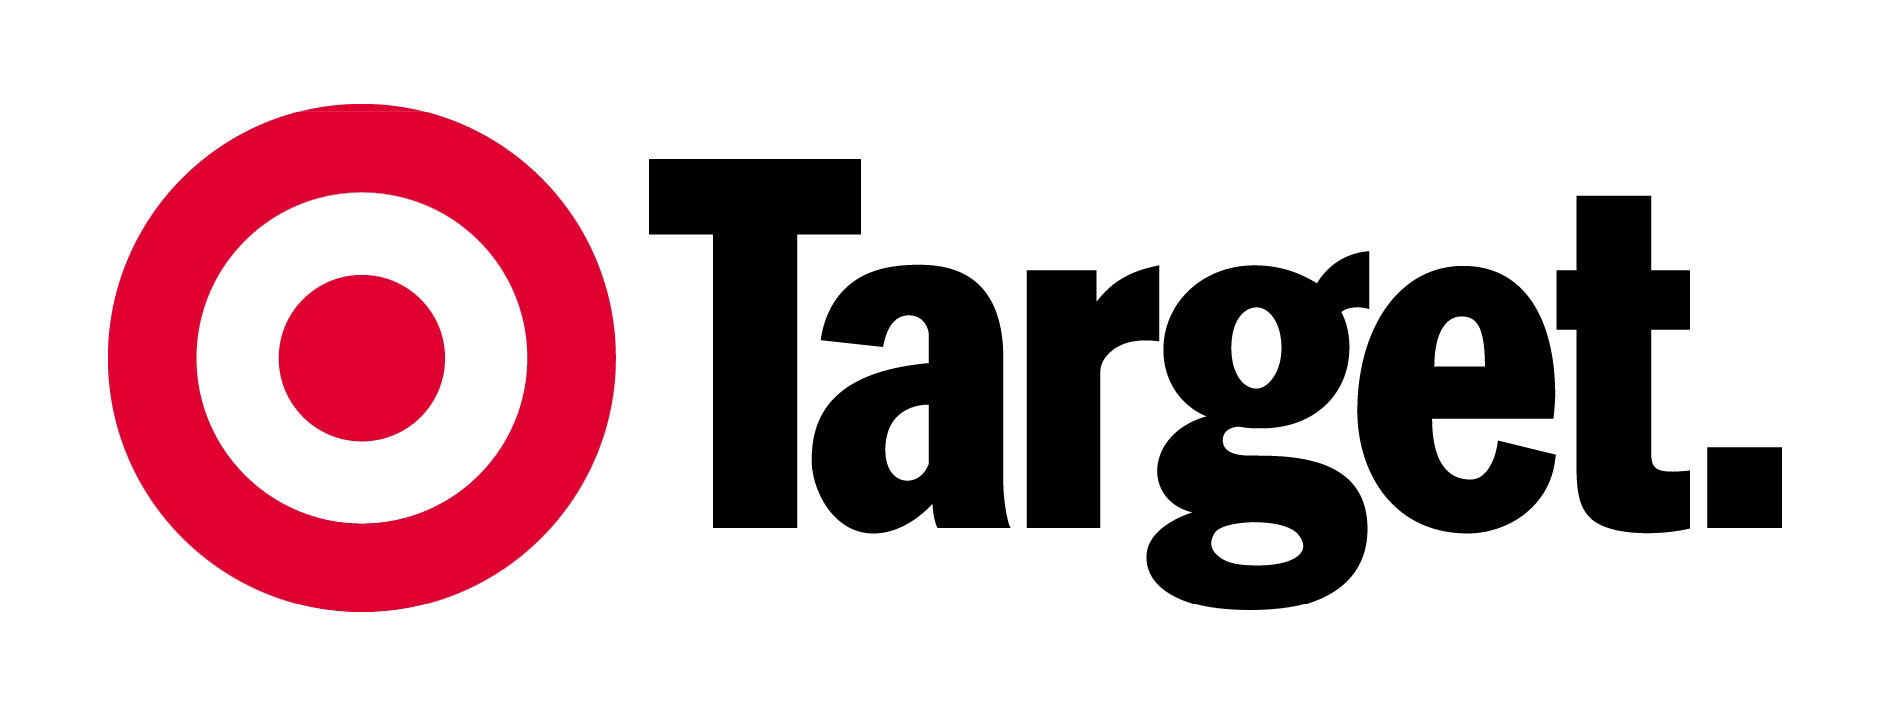 closer live 1 target logo